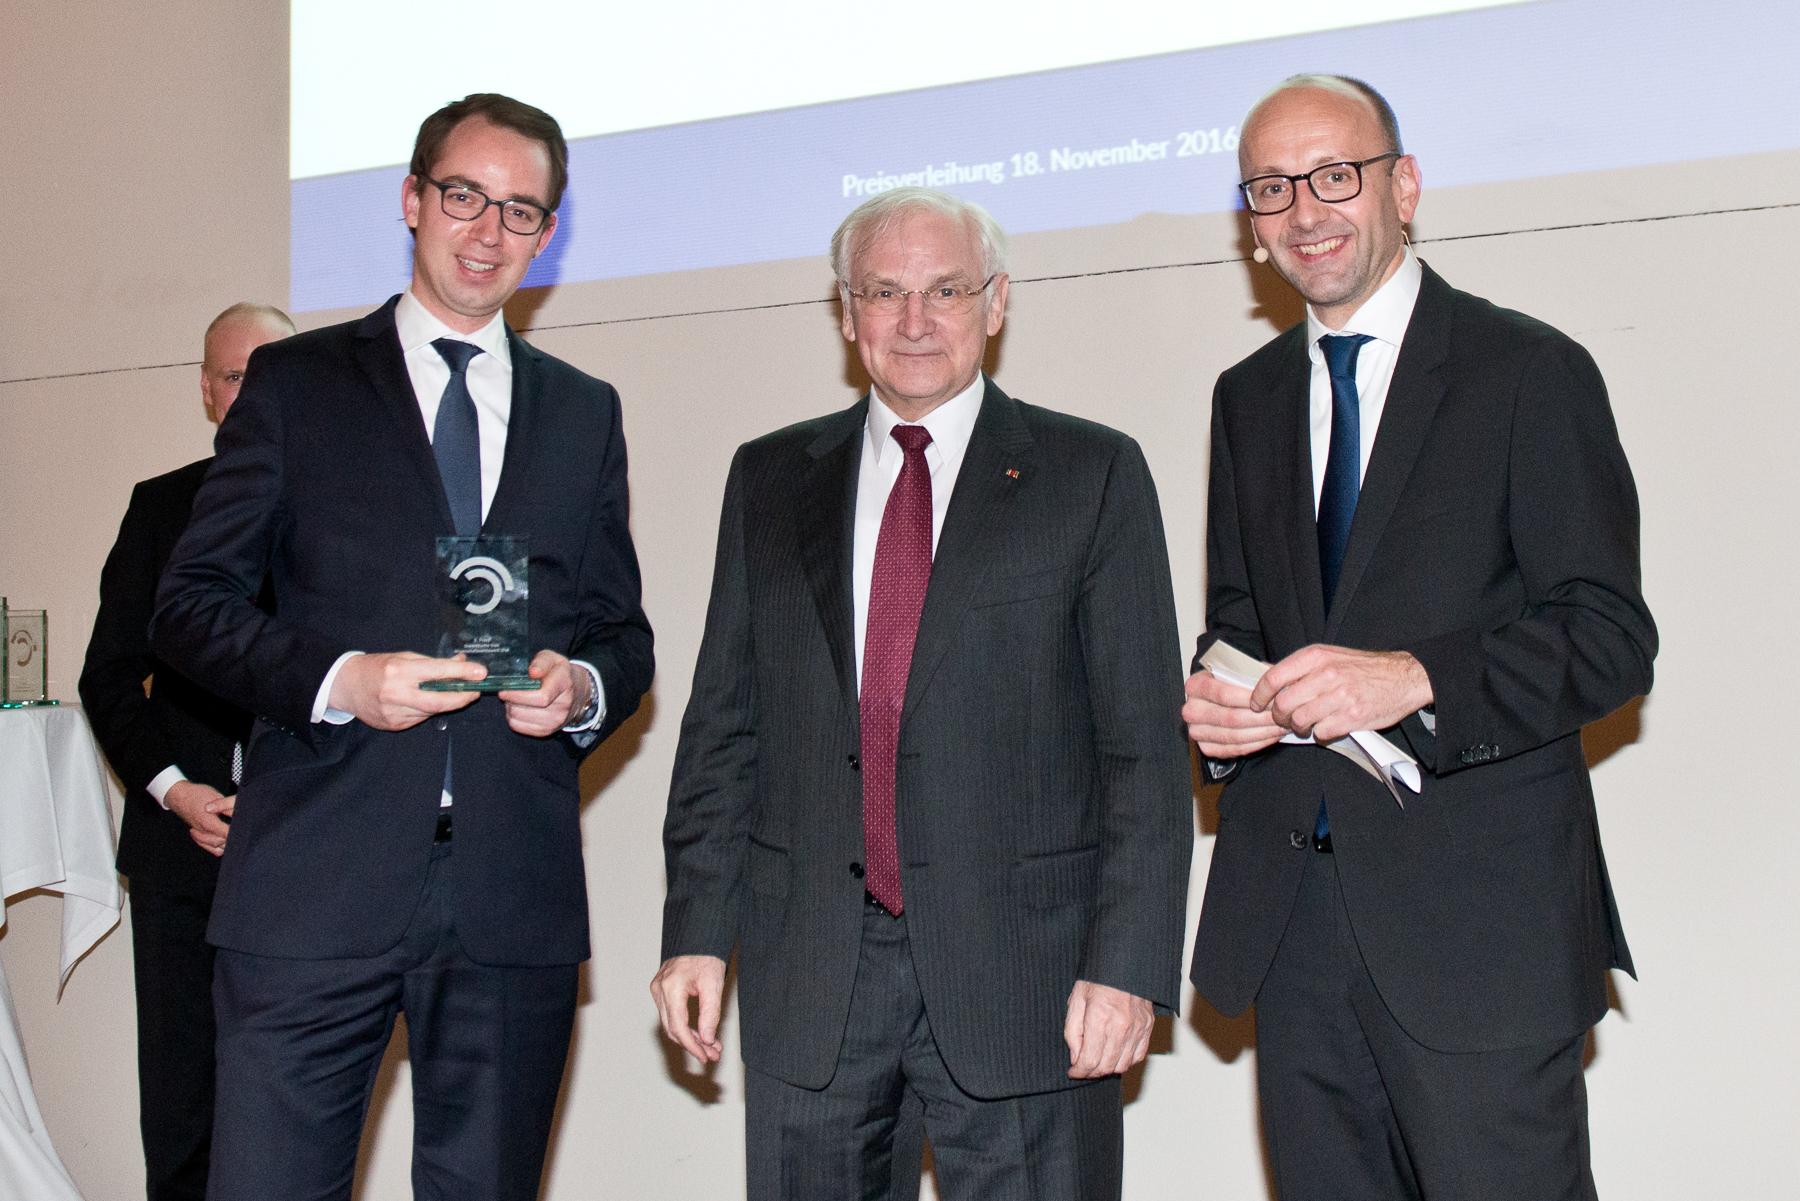 Dr. Helge Pühl (3. Preis), Prof. Dr. Siegfried Beck, Prof. Dr. Lucas F. Flöther